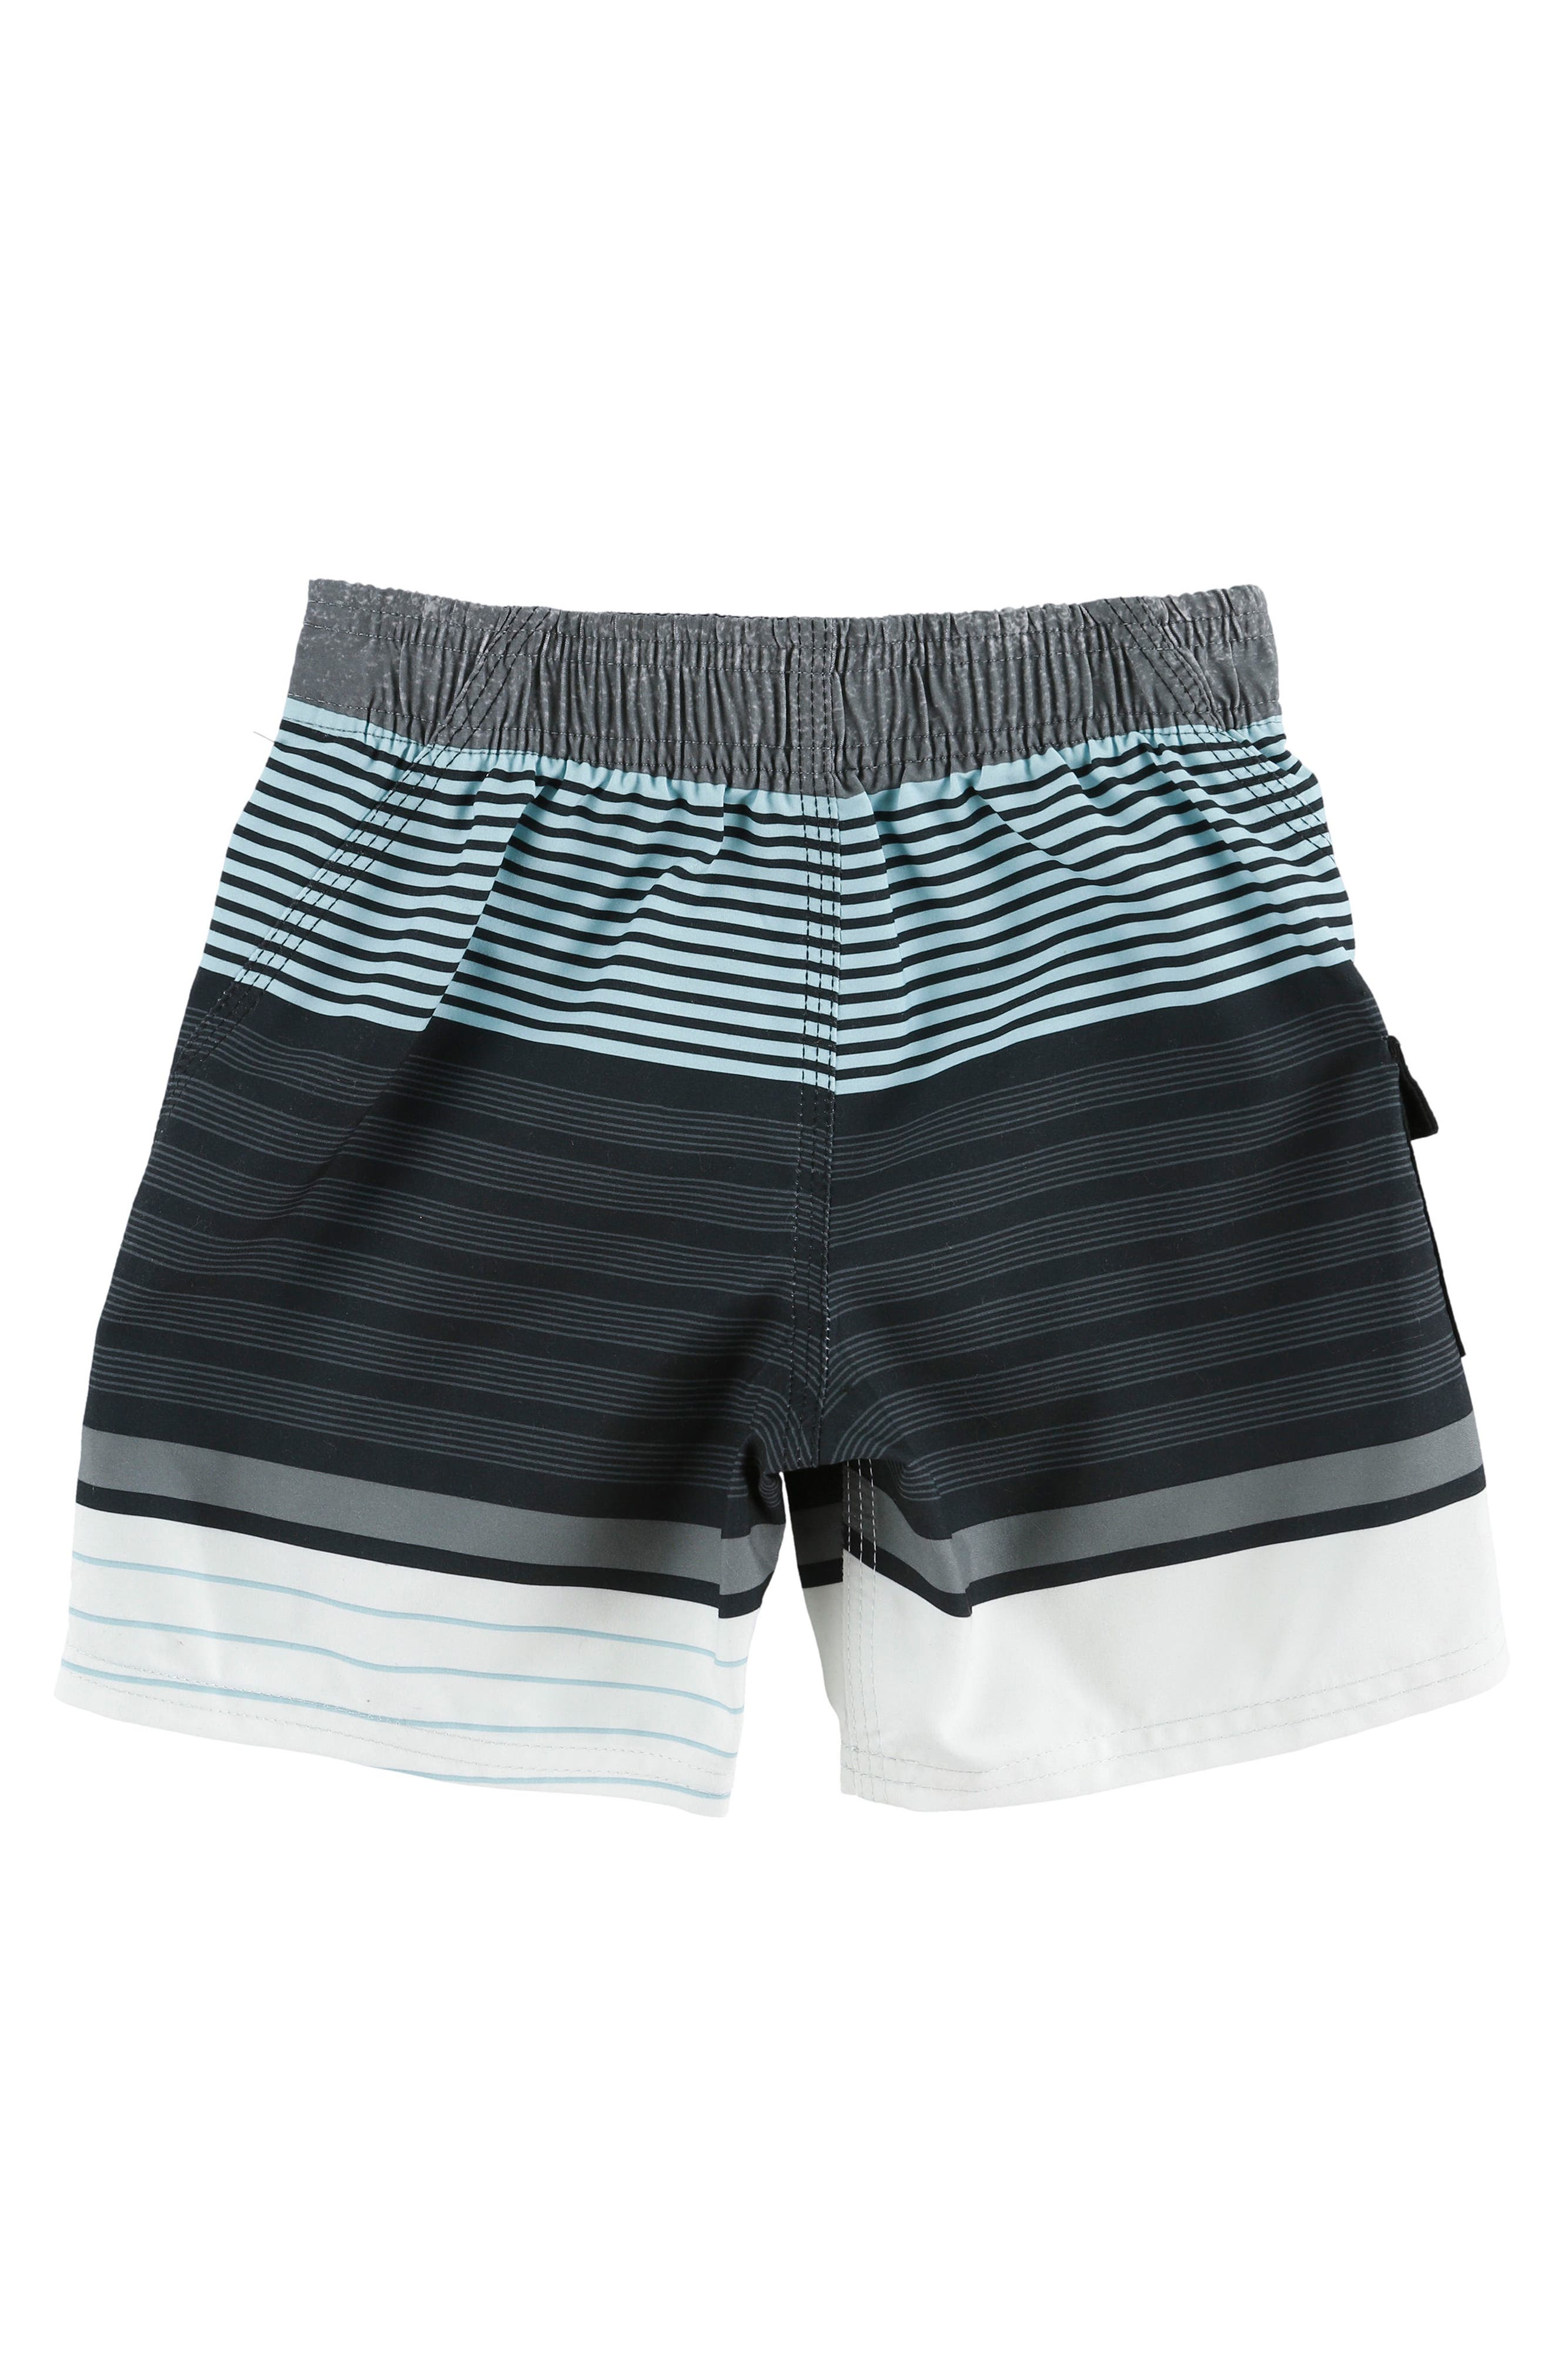 Lennox Stripe Board Shorts,                             Alternate thumbnail 2, color,                             Asphalt